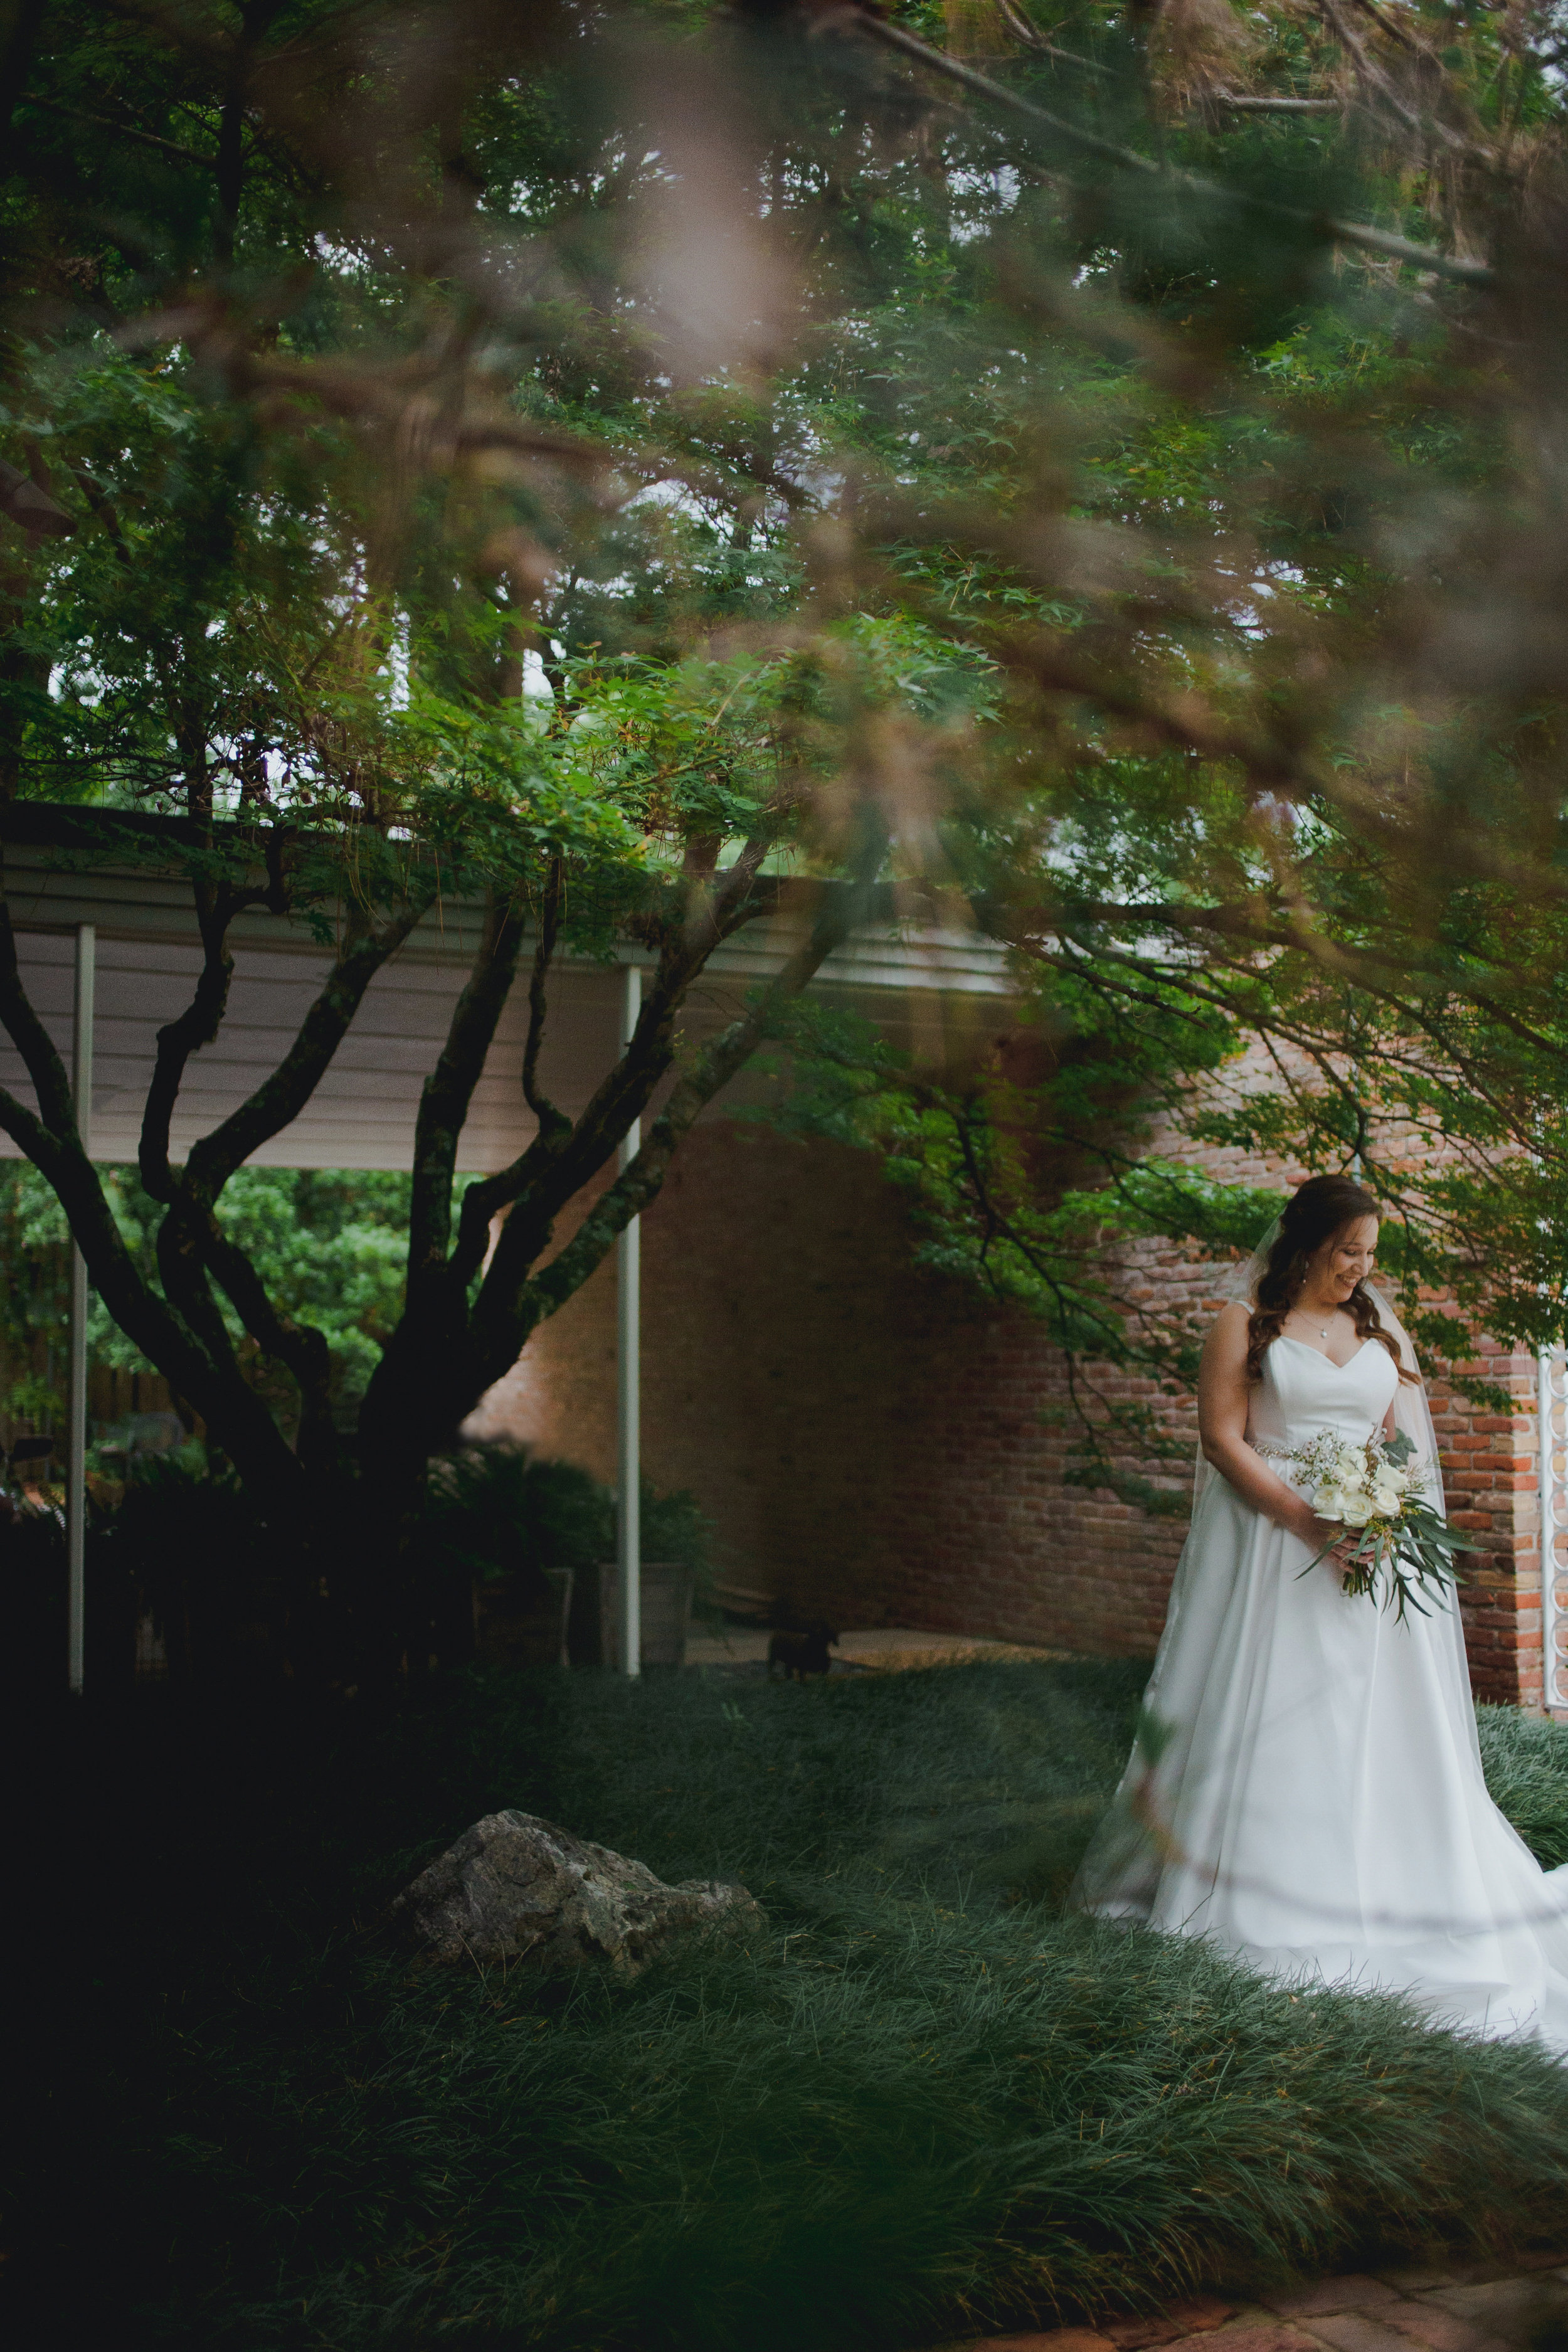 monroe-wedding-photographer-5.jpg